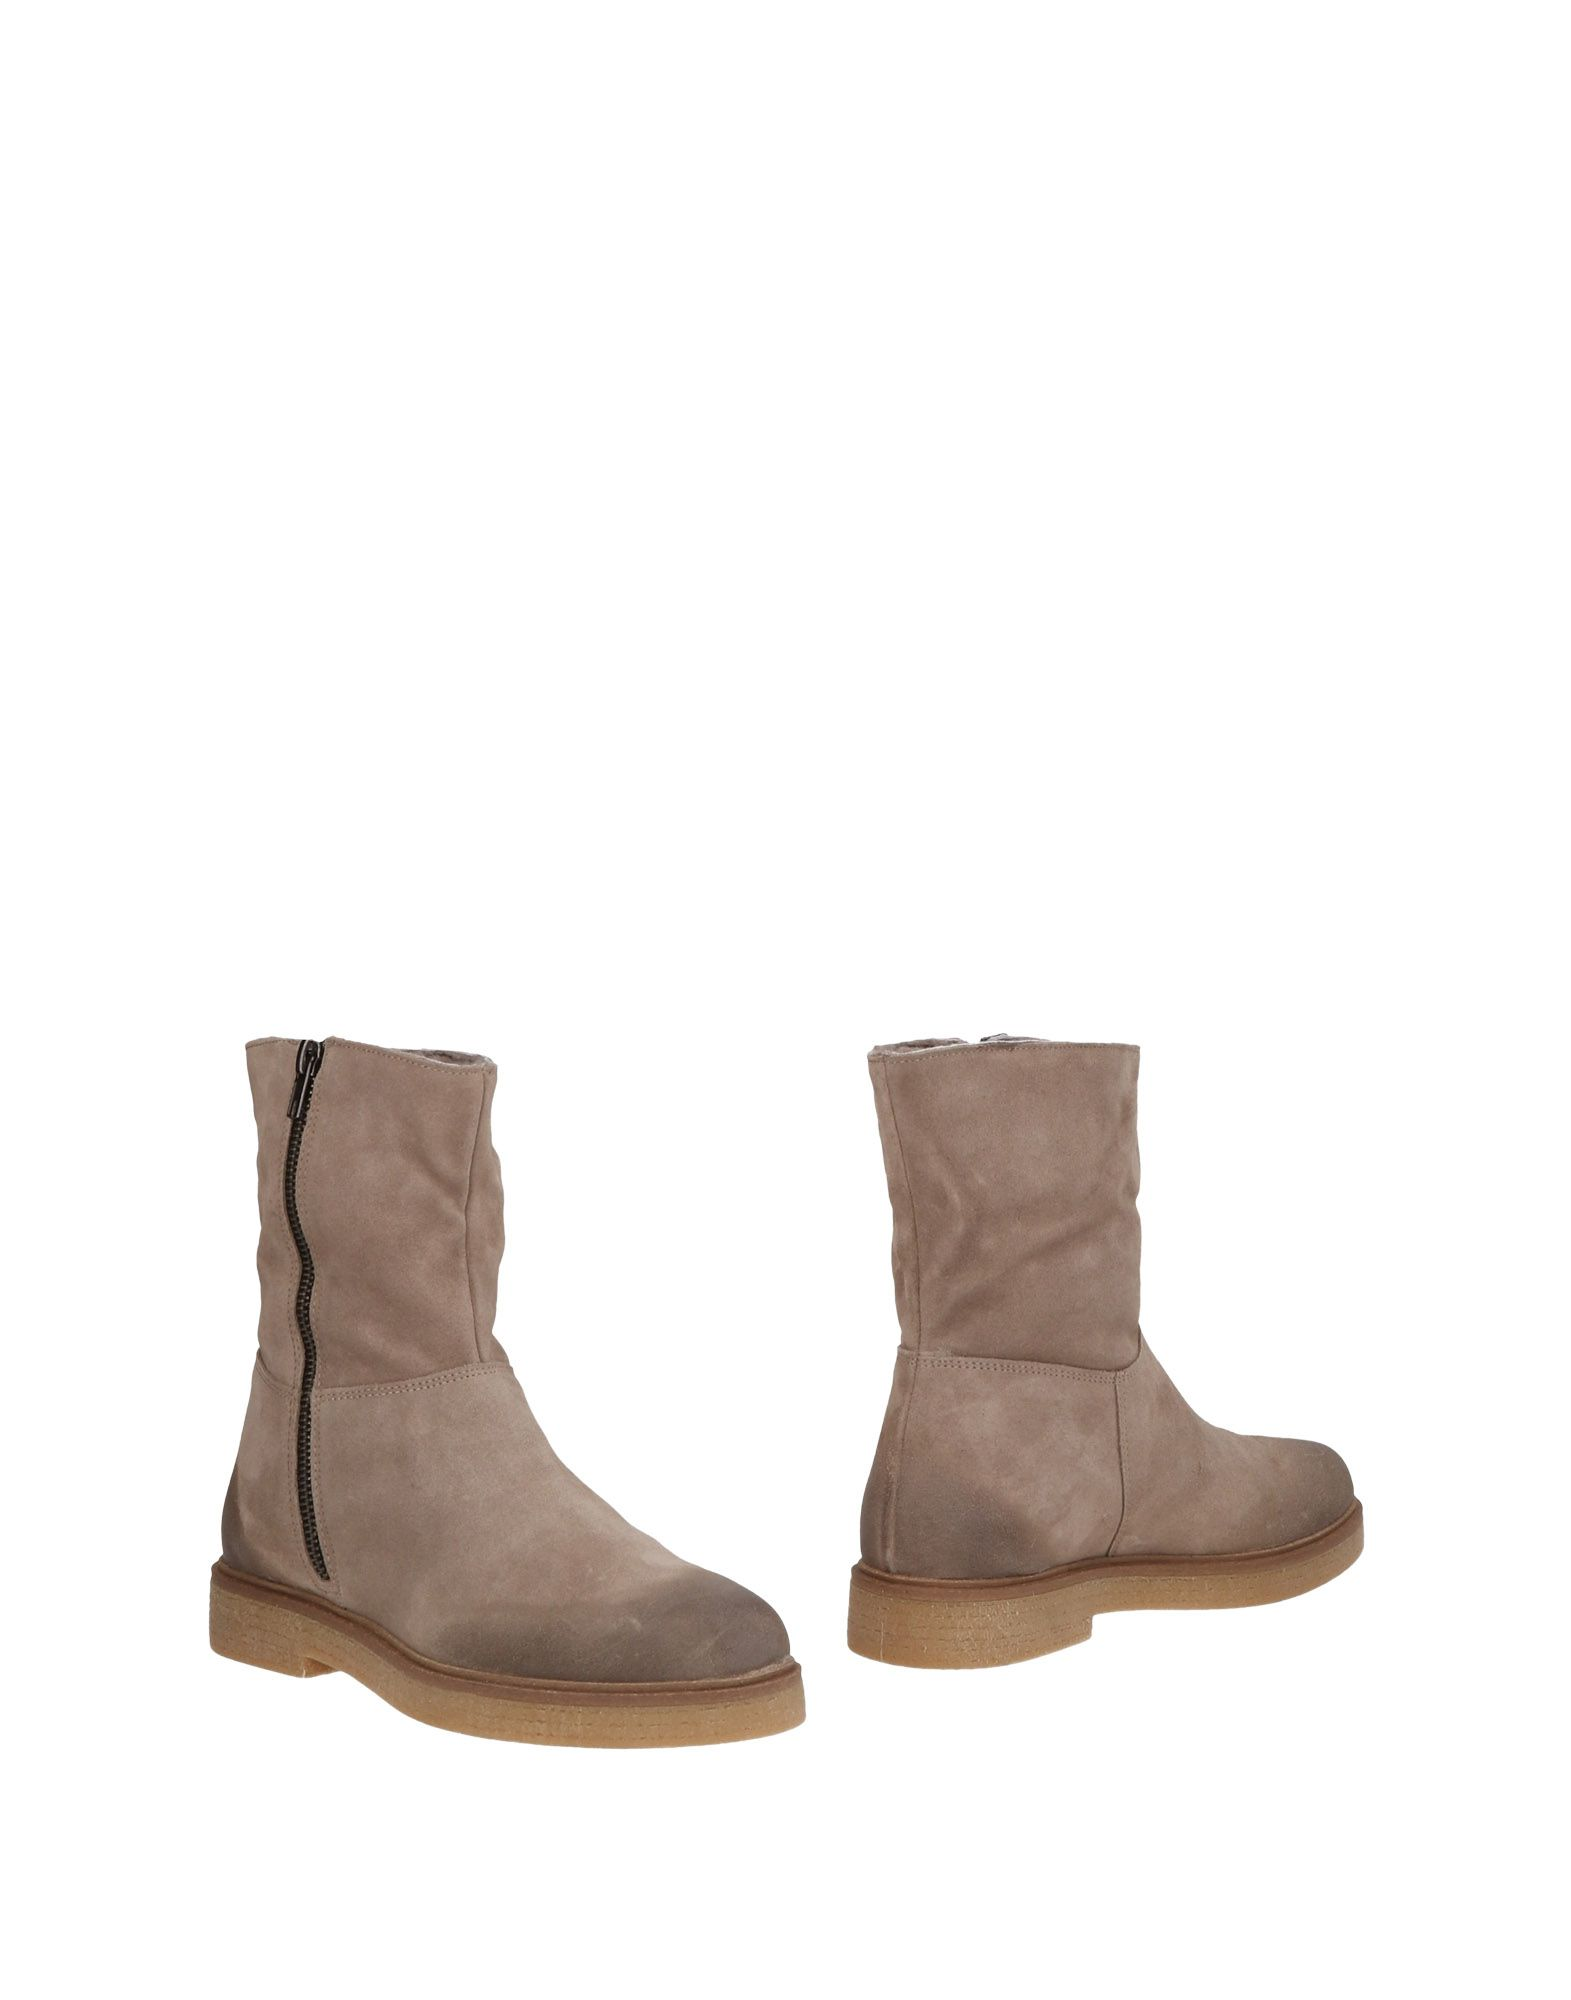 Stilvolle billige Schuhe Paola Ferri Stiefelette Damen  11477677KF